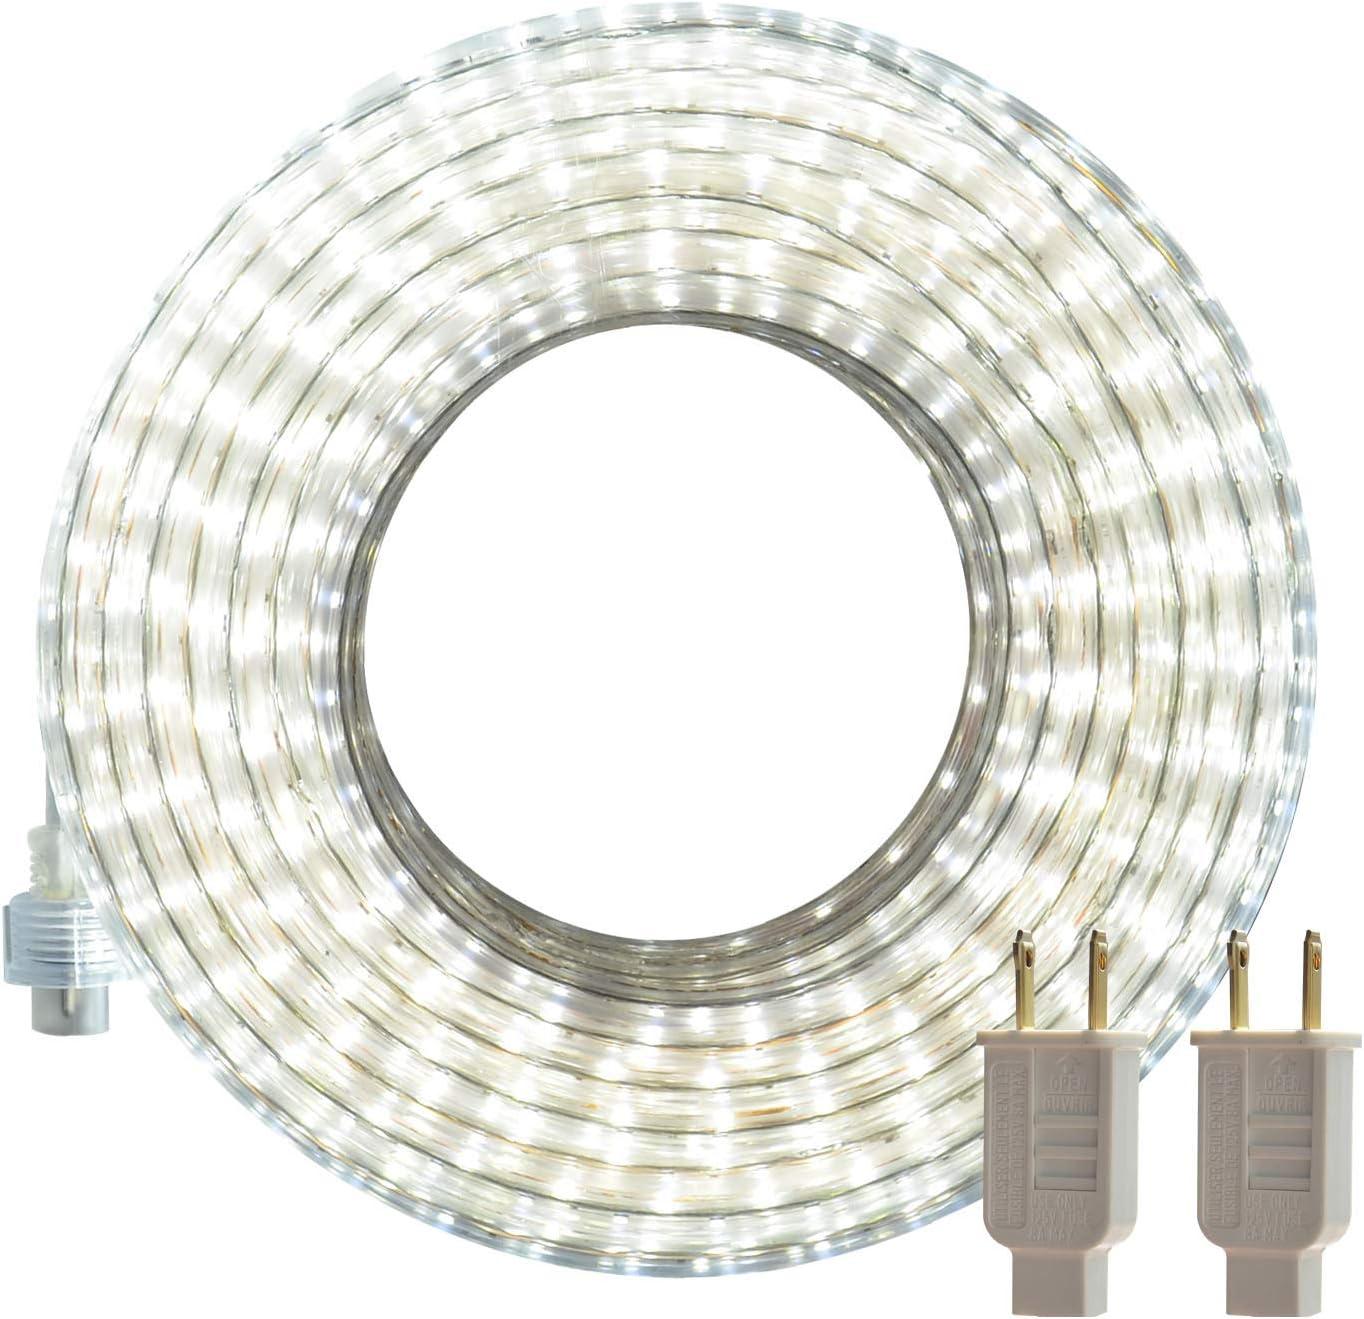 Light Connector White LED Strip Light Mounting Bracket Fixer Clip Lamp Tape Fix